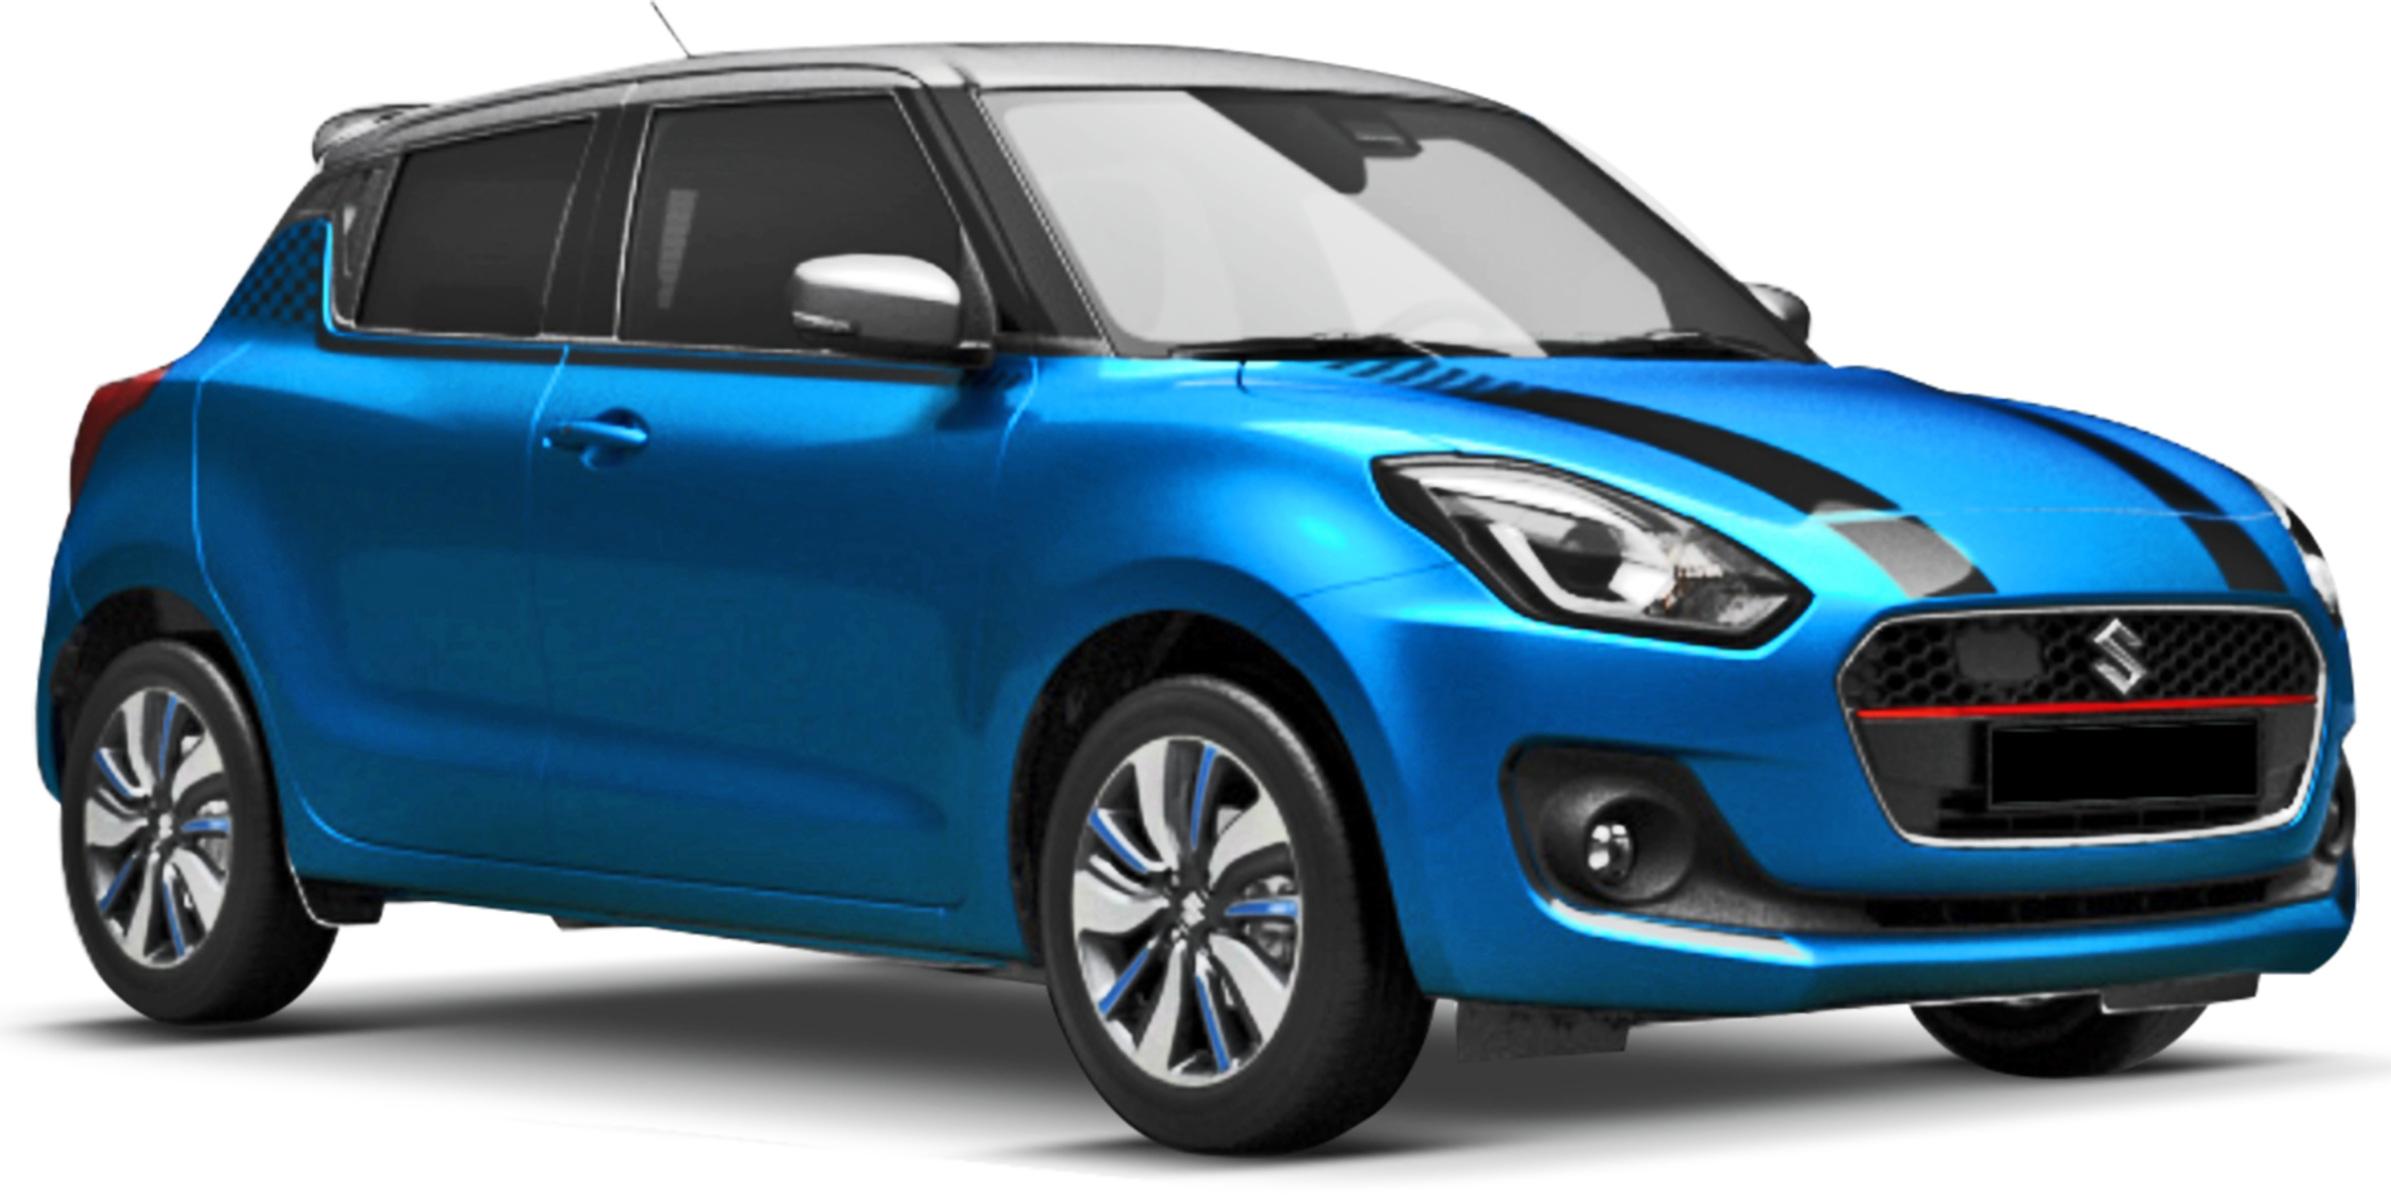 Suzuki Swift Sport Price In India